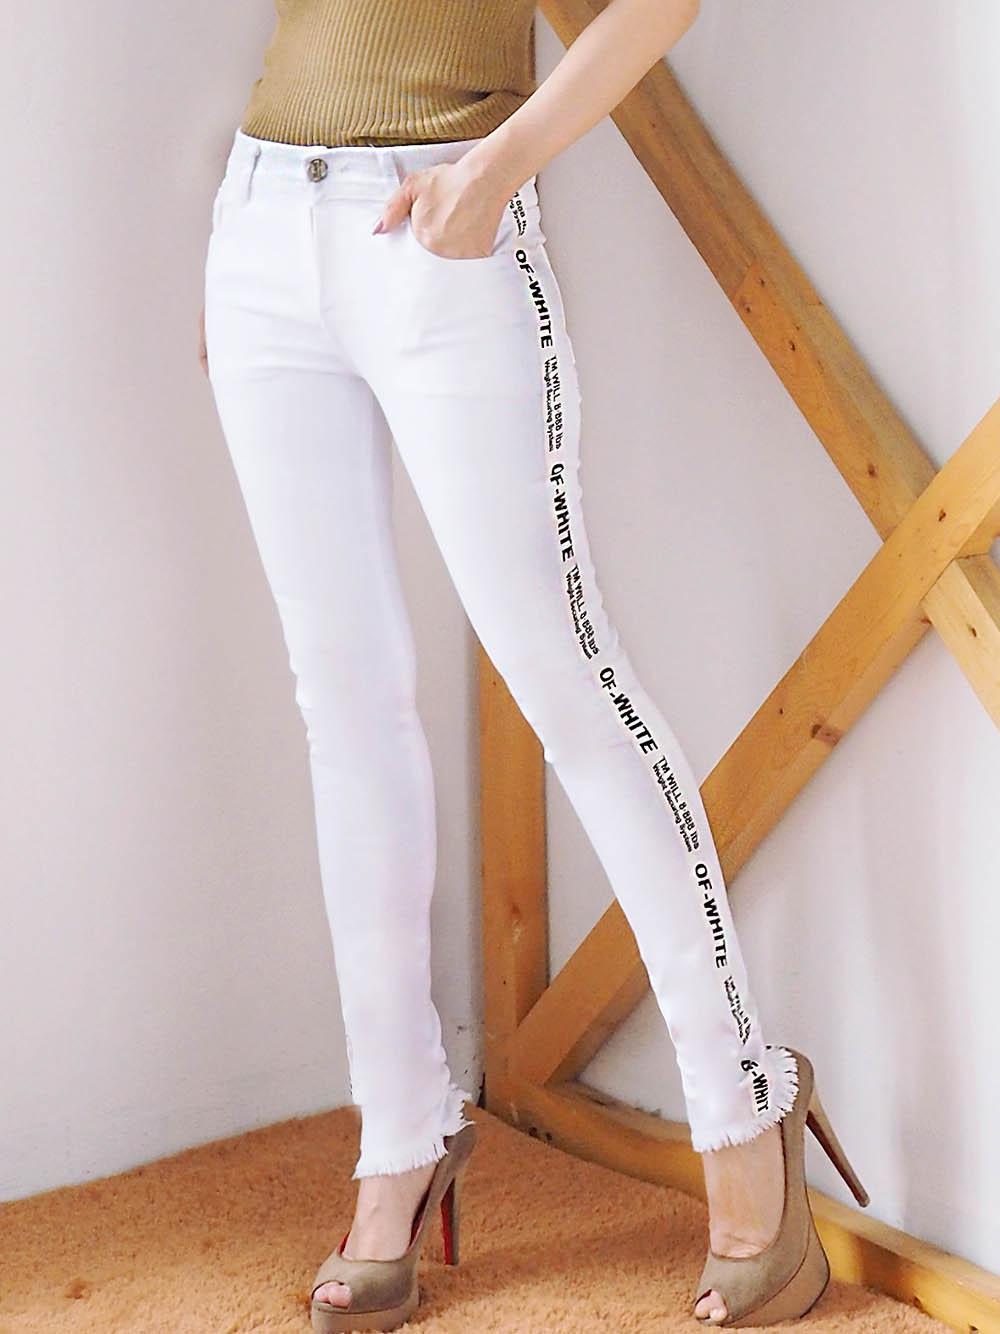 Celana Skinny Jeans Wanita - Celana List White Dem - Celana Jumbo bigsize - Ancienstore -